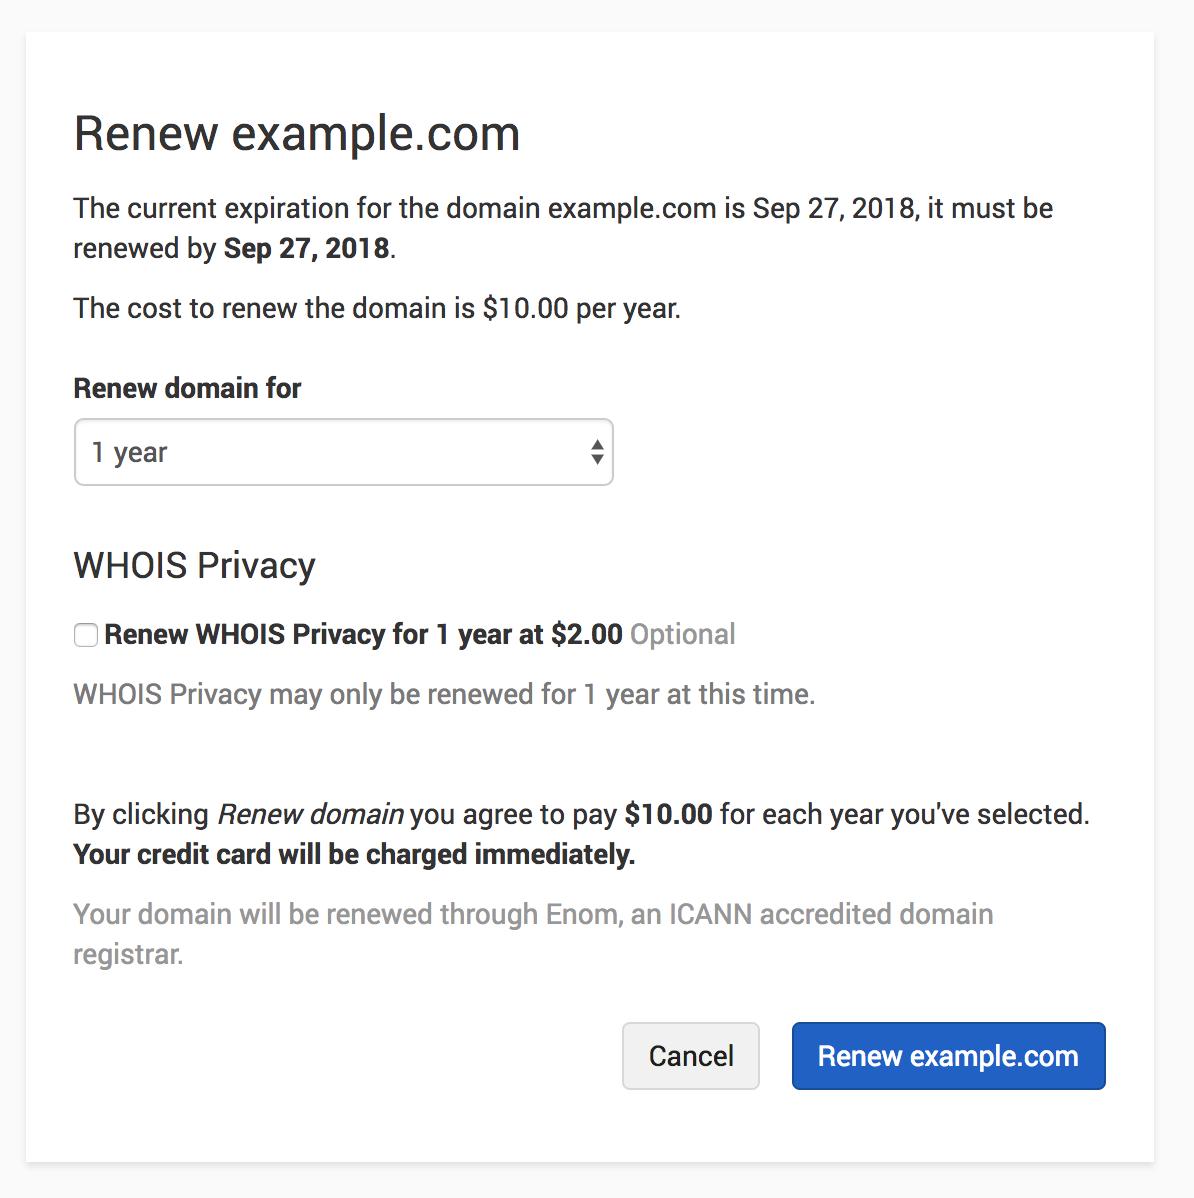 Renew domain form